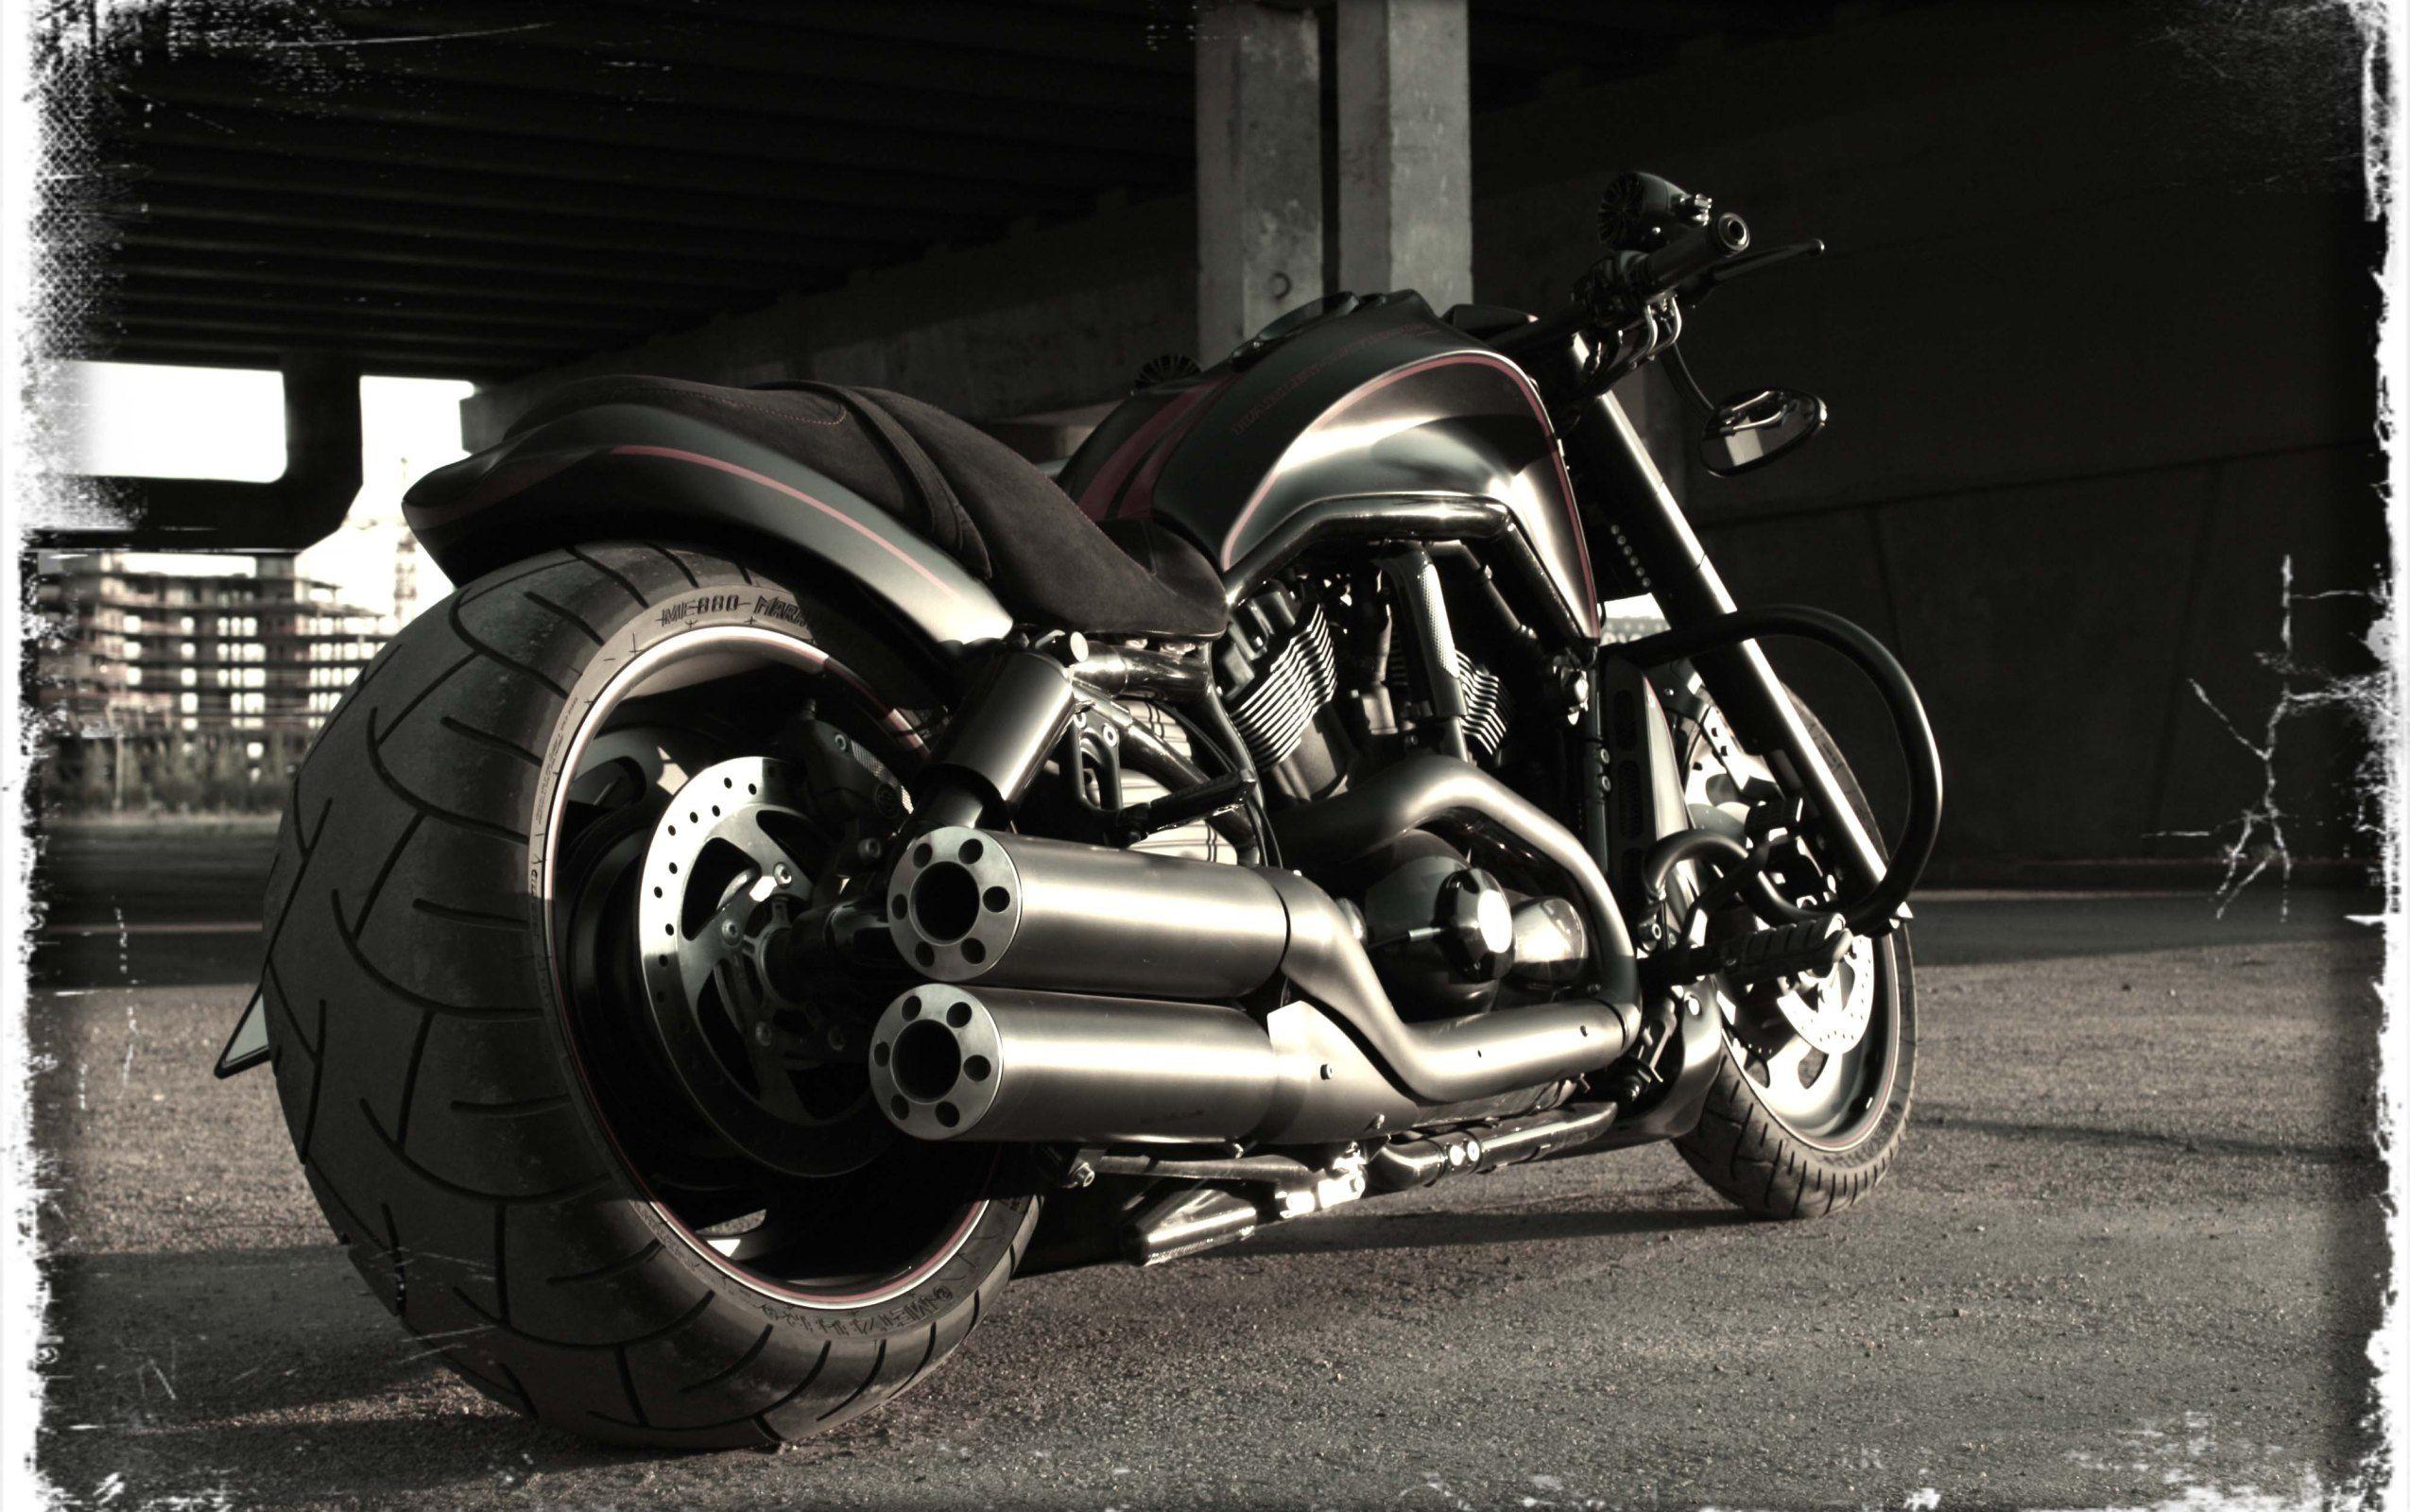 Harley Davidson Vrscdx Night Rod Special Mah Dream Bike Harley Davidson Pictures Harley Davidson Night Train Harley Davidson Wallpaper